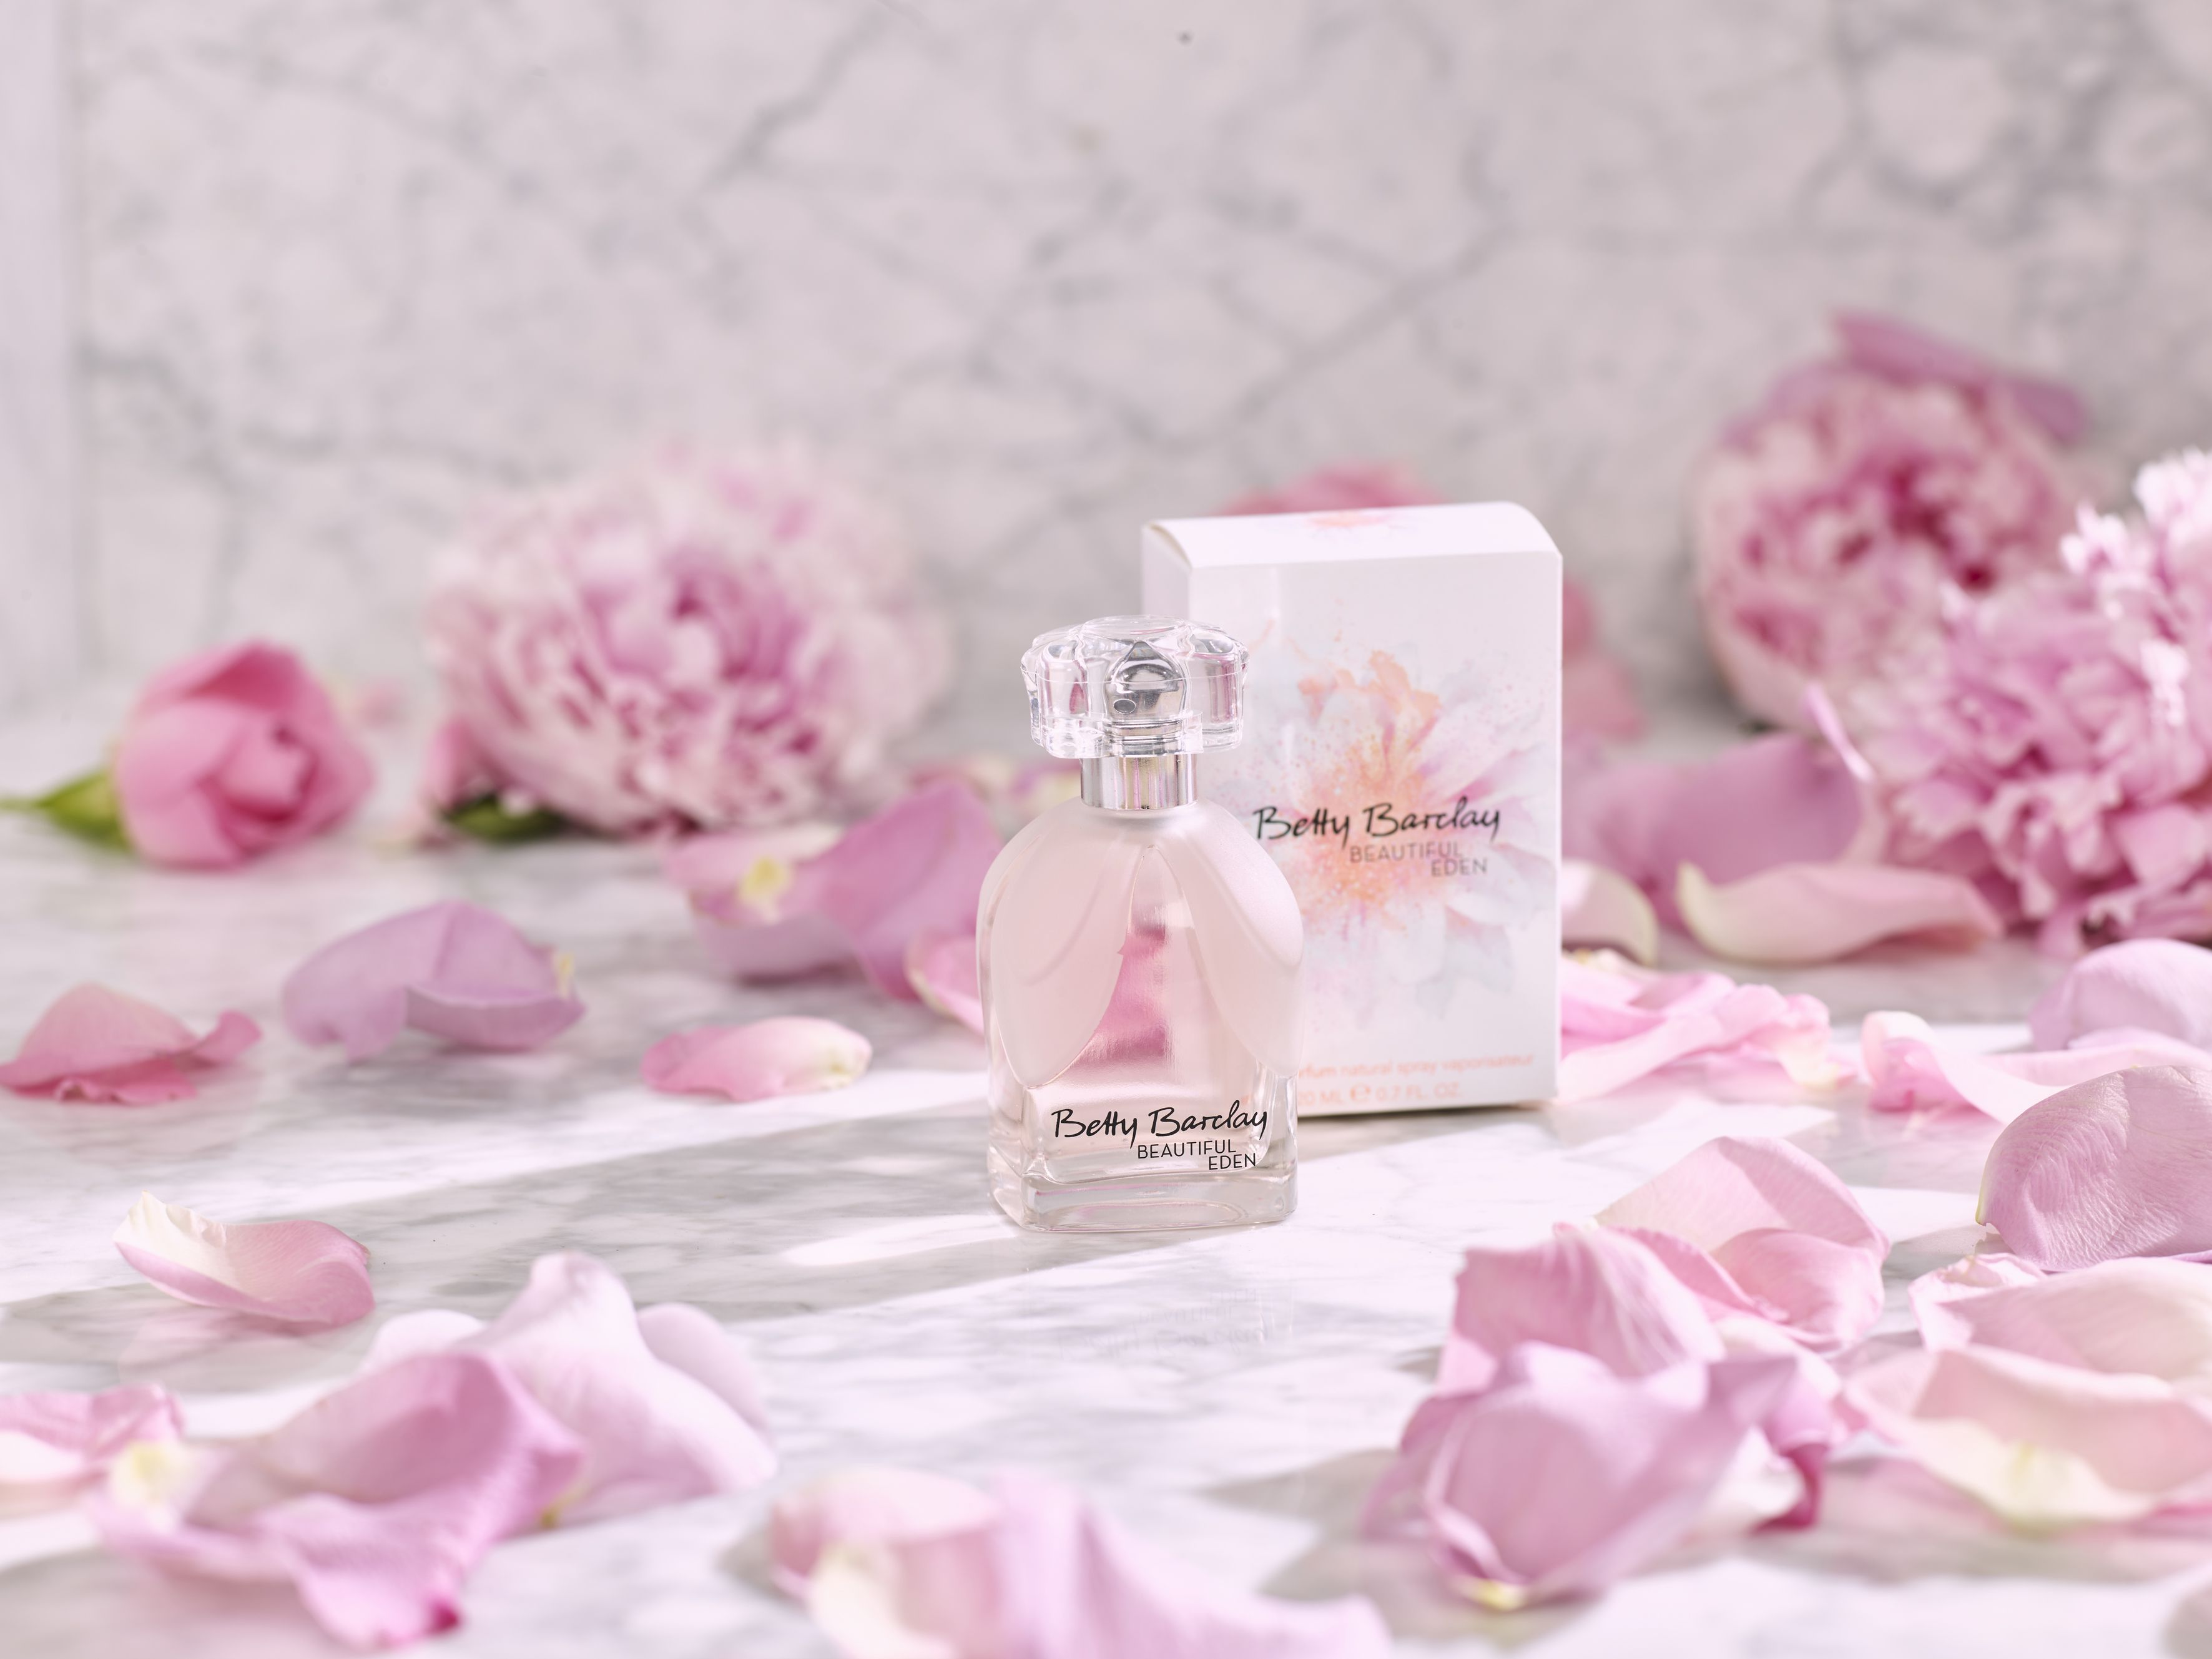 Betty Barclay Beautiful Eden Edt 20ml Parfum Vasarlas Olcso Betty Barclay Beautiful Eden Edt 20ml Parfum Arak Akciok